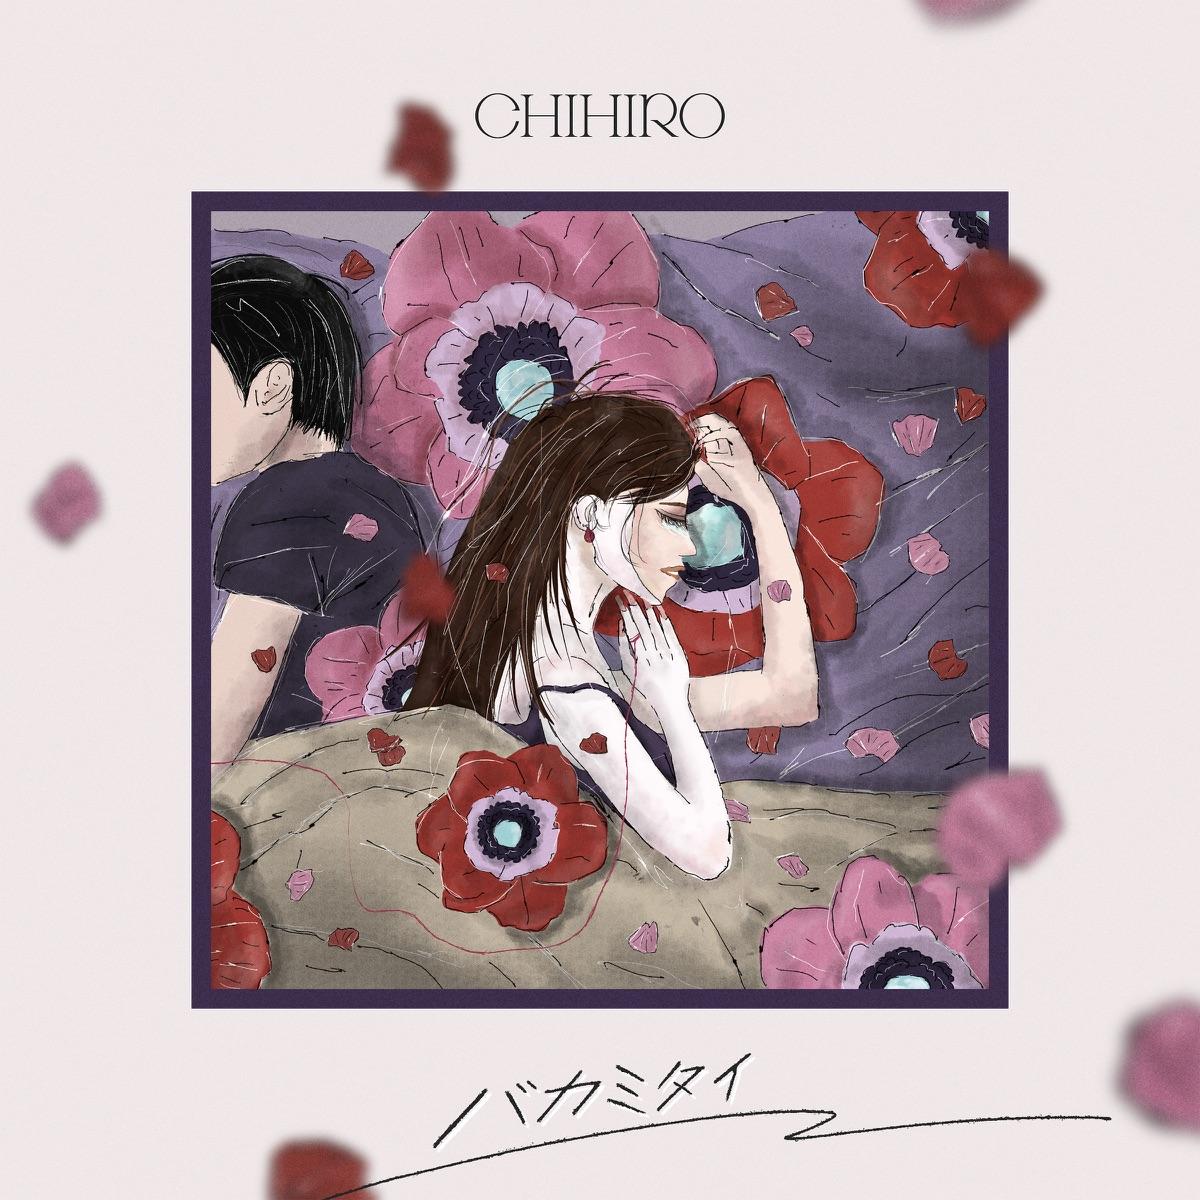 『CHIHIRO - バカミタイ 歌詞』収録の『バカミタイ』ジャケット